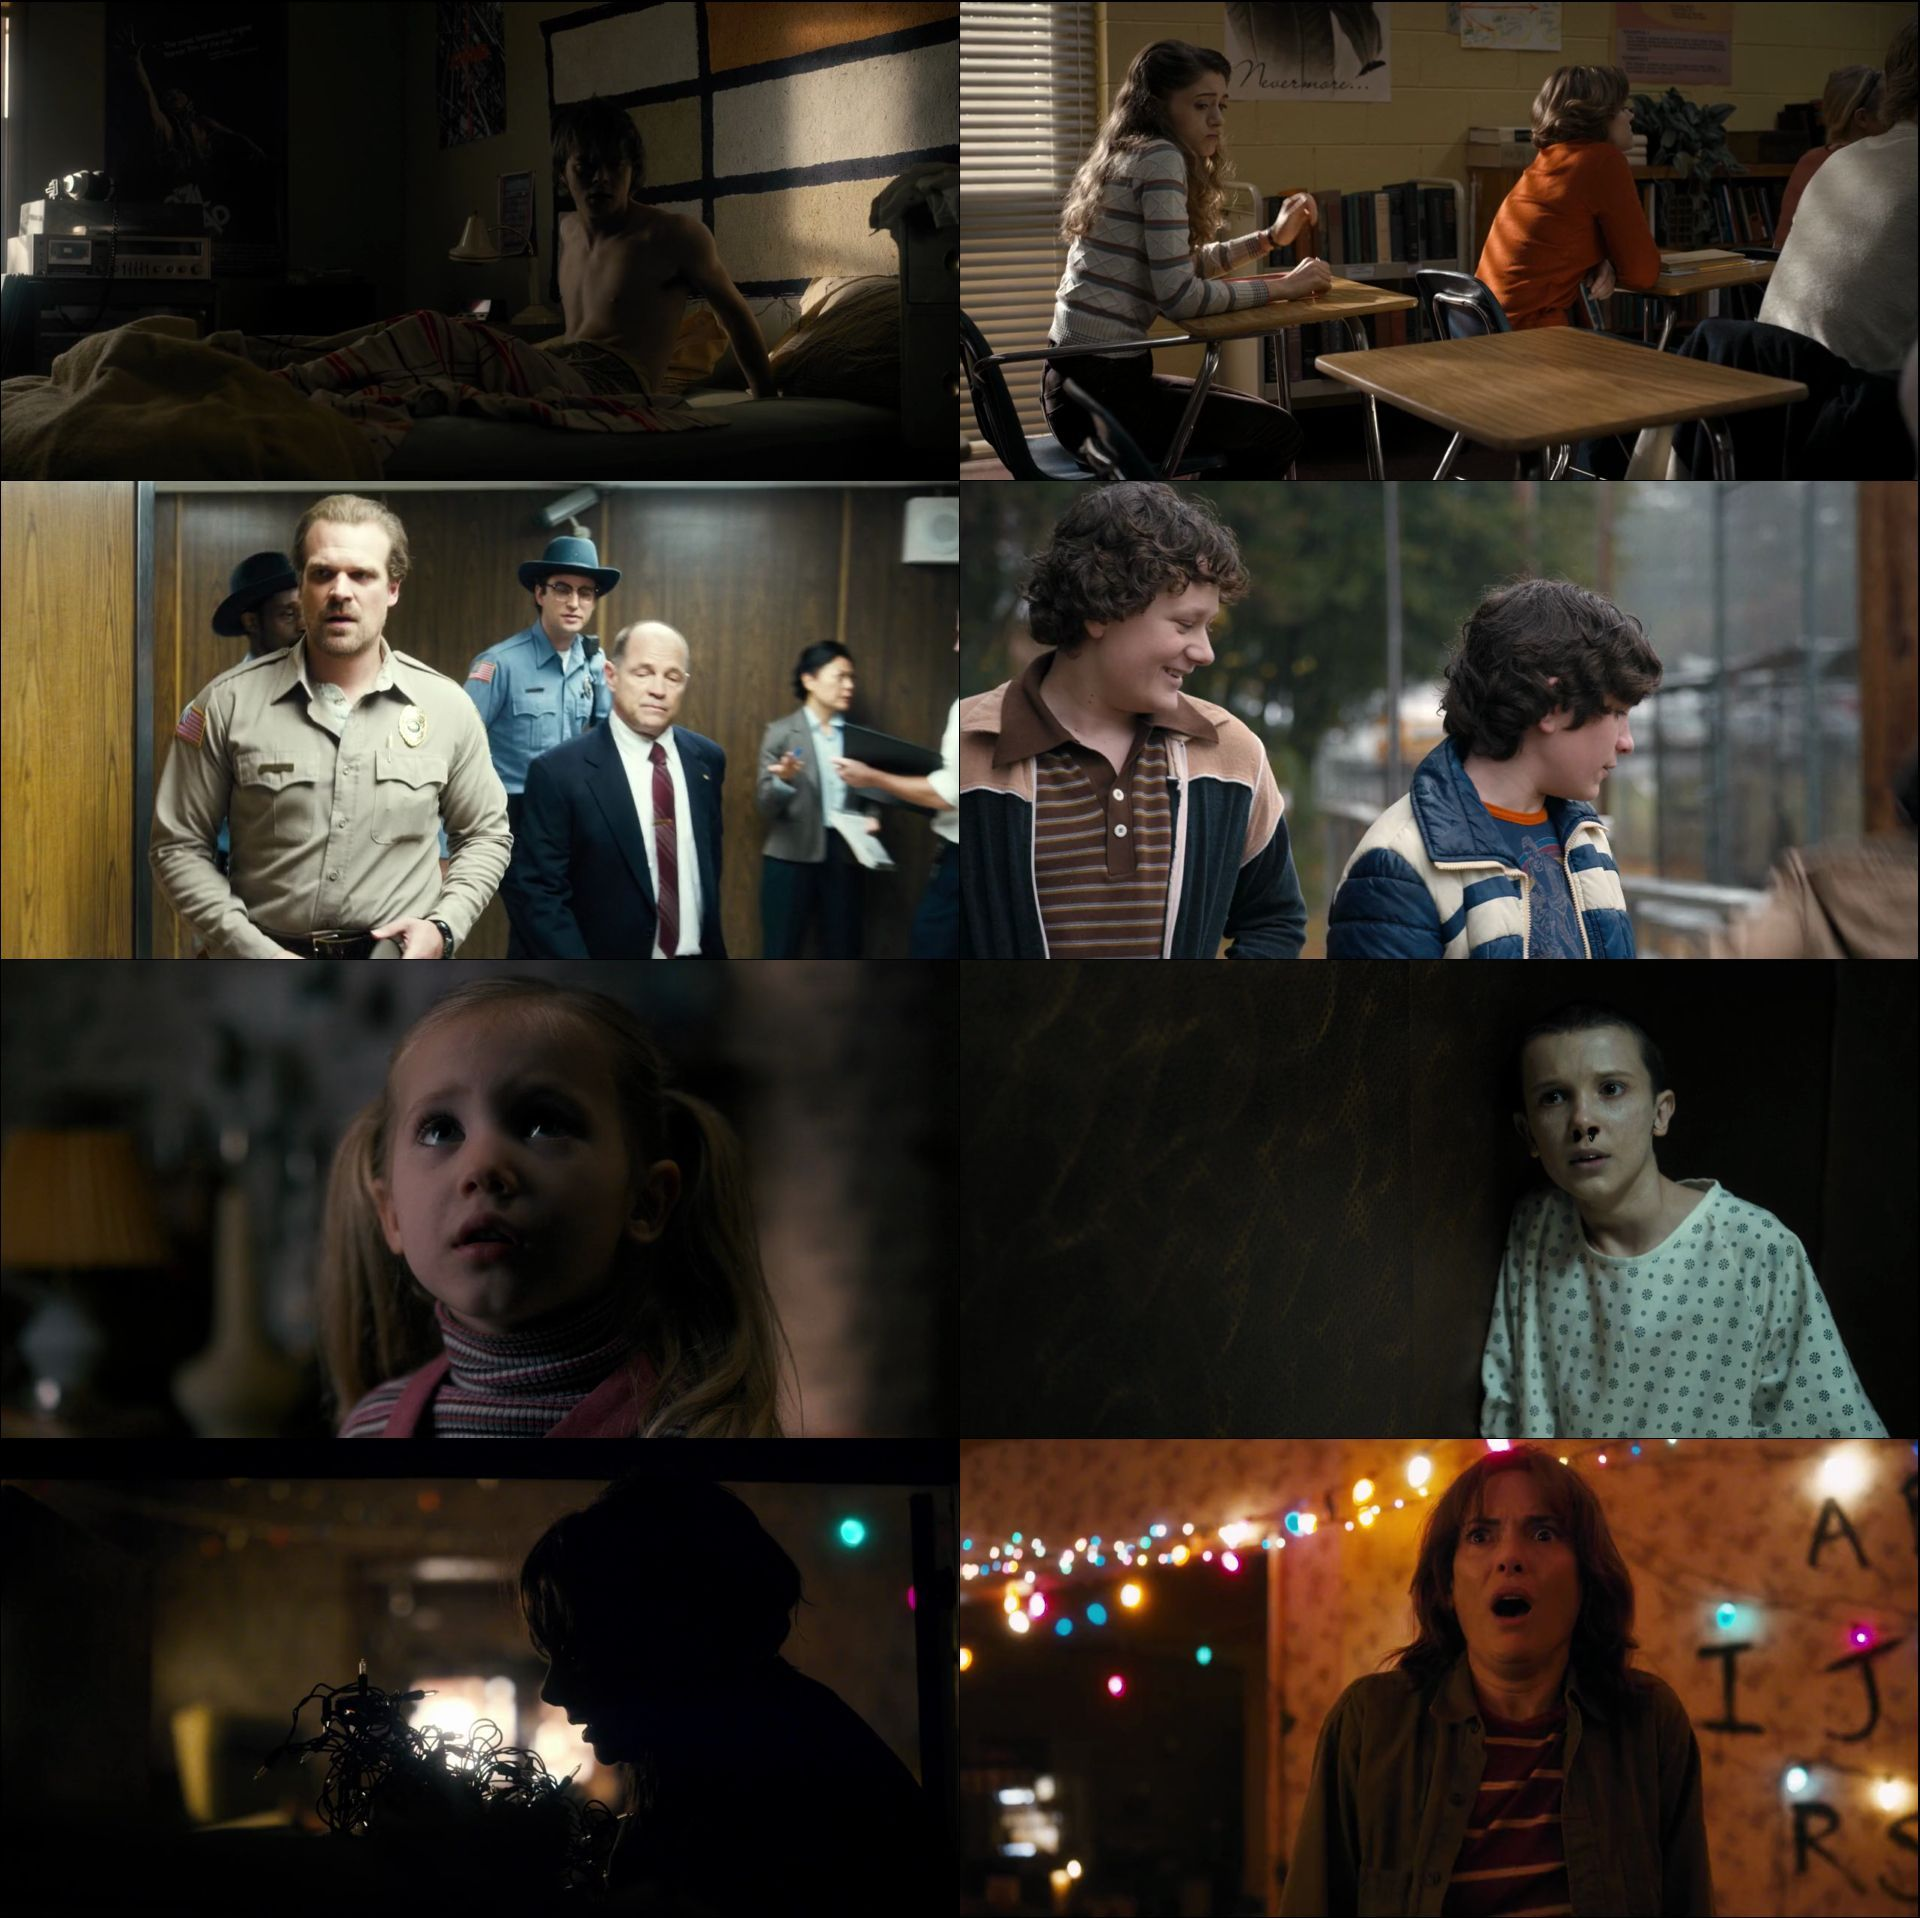 Stranger Things (2016) Sezon 1 Tüm Bölümler (m720p m1080p WEBDL x264) Türkçe dublaj indir